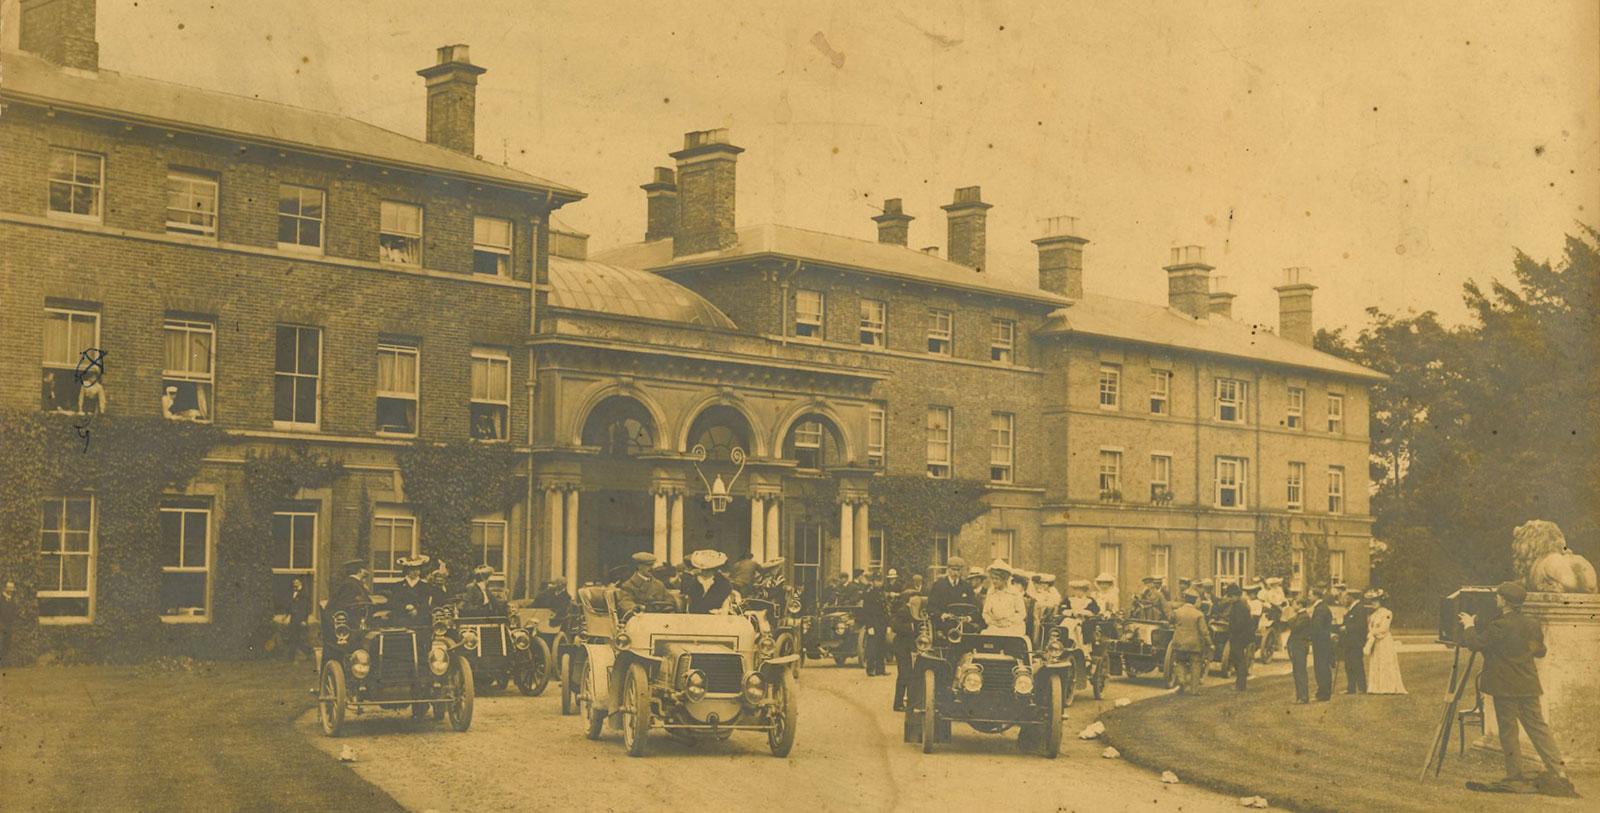 Image of Event Space Oatlands Park Hotel, 1856, Member of Historic Hotels Worldwide, in Weybridge, England, Experience